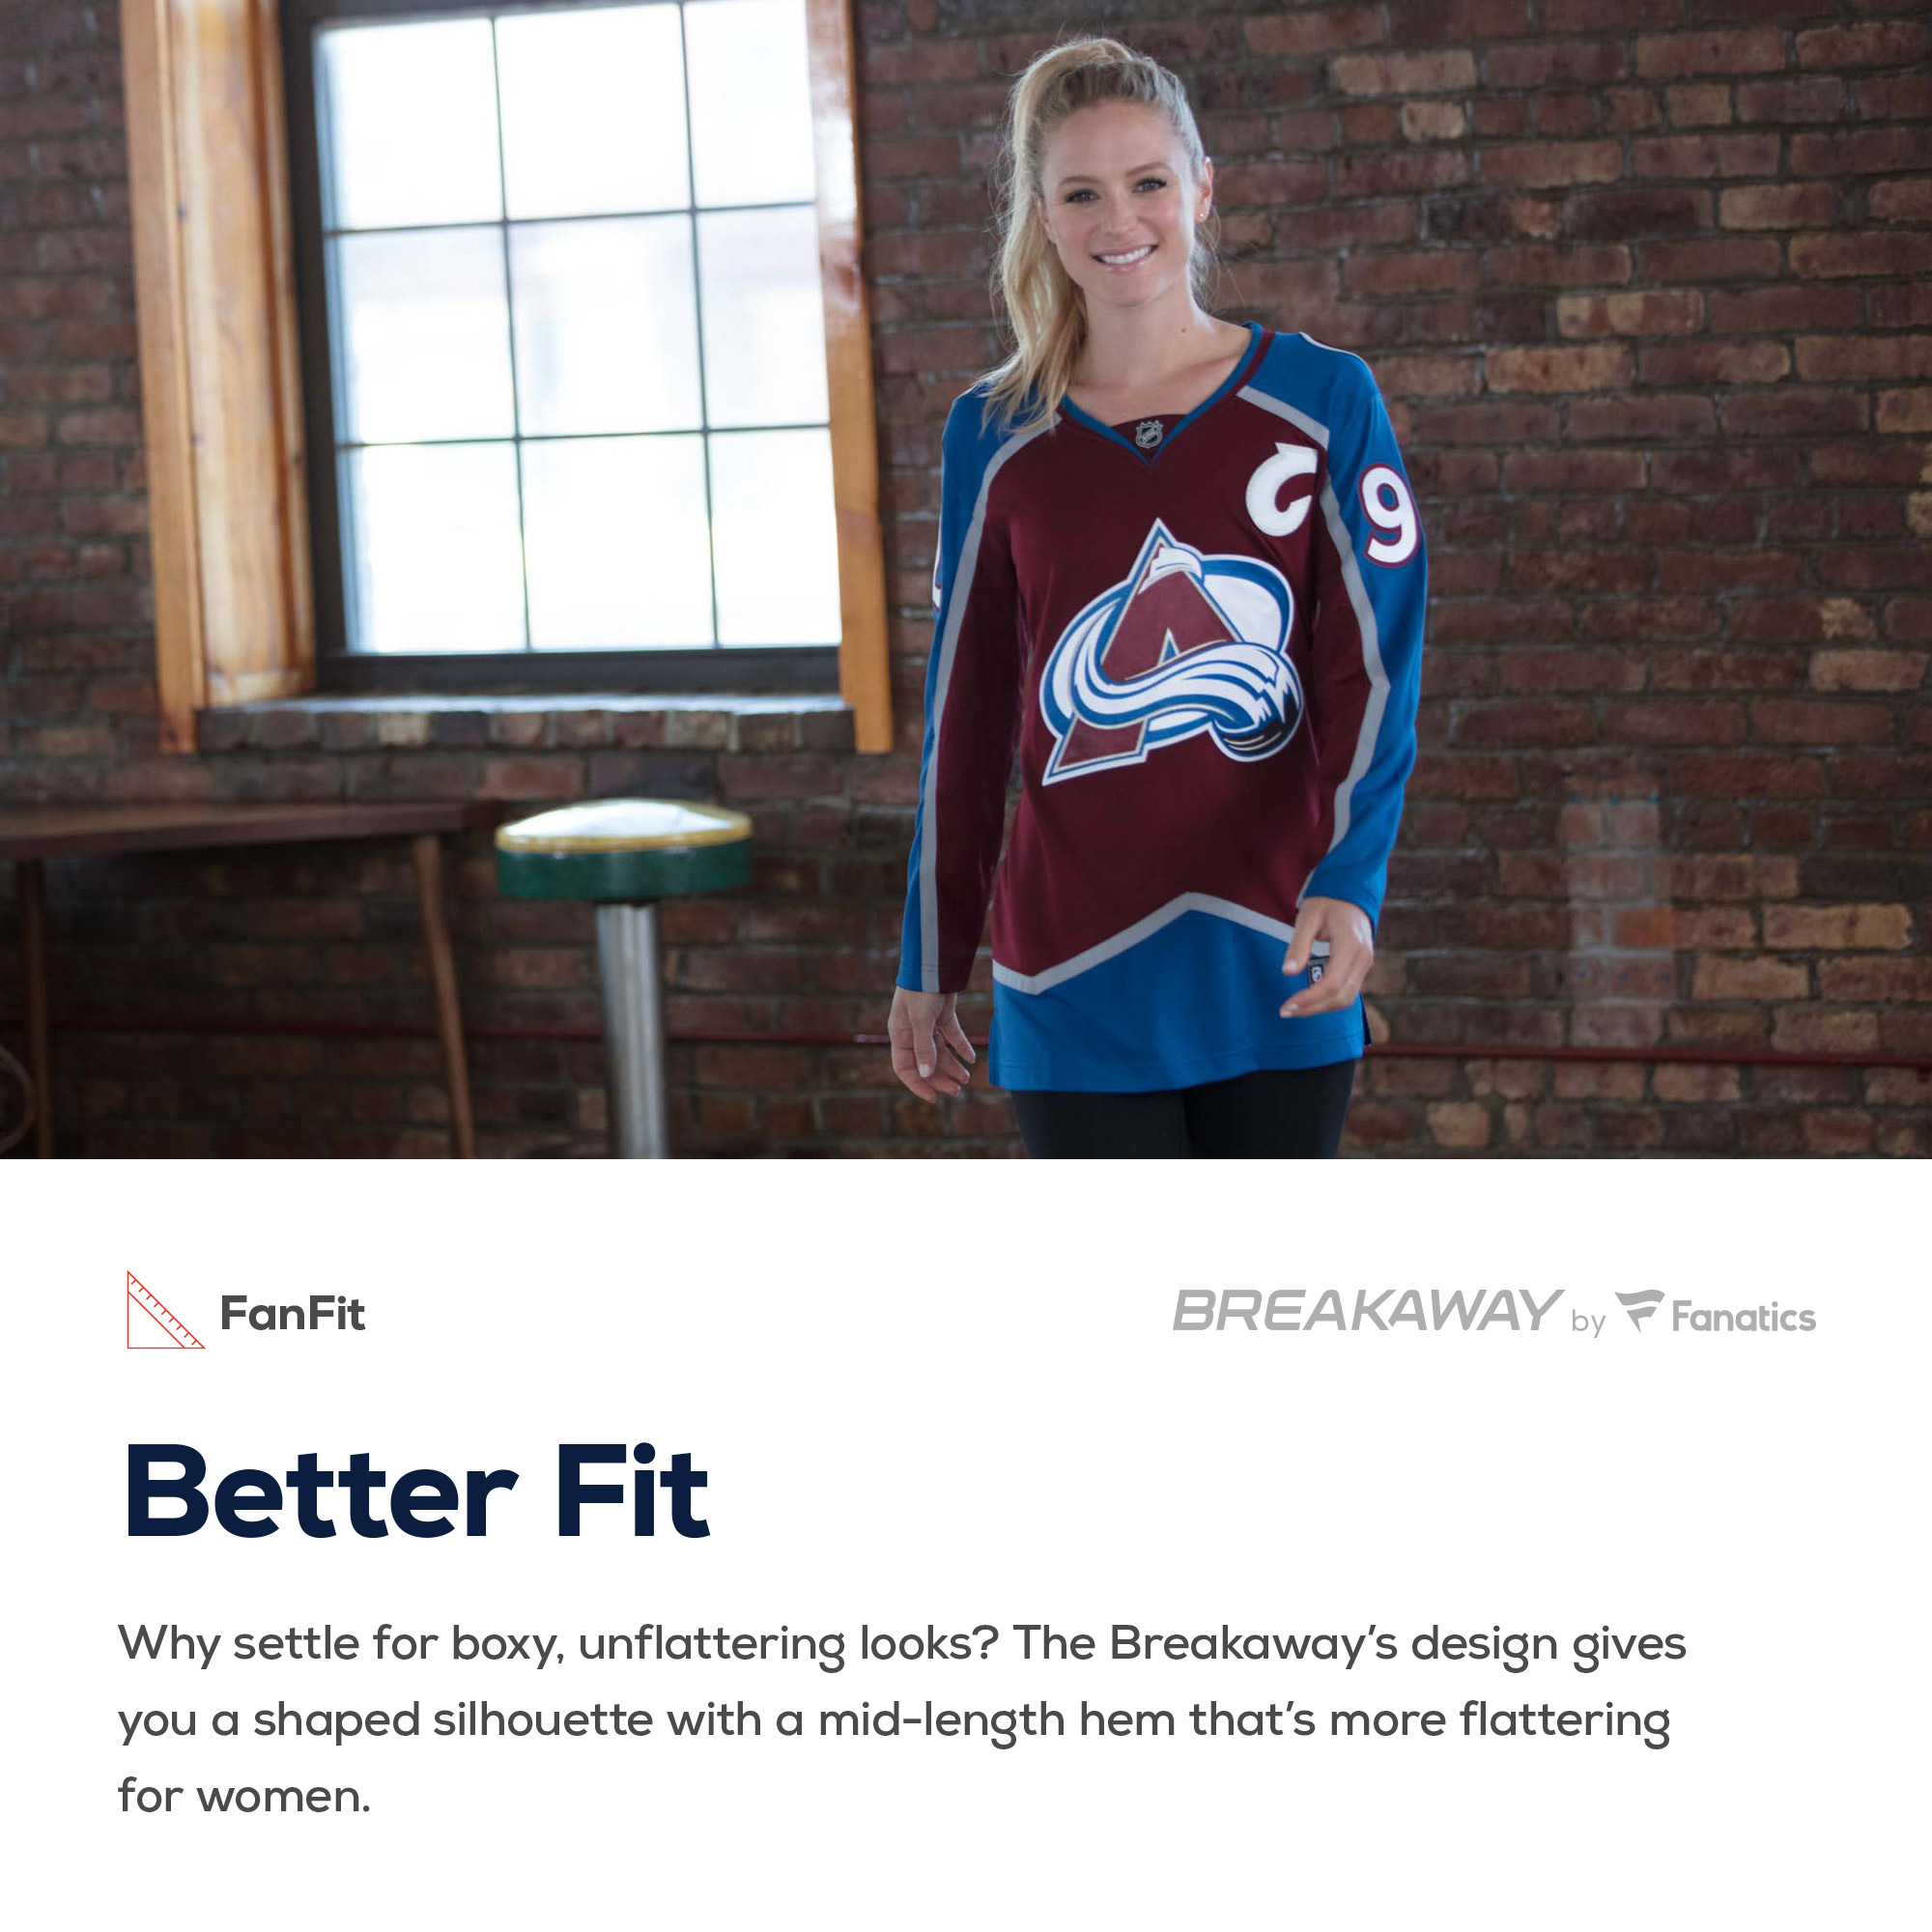 Tyson Jost Colorado Avalanche Fanatics Branded Women s Breakaway Player  Jersey - Burgundy - Walmart.com 19c45f288